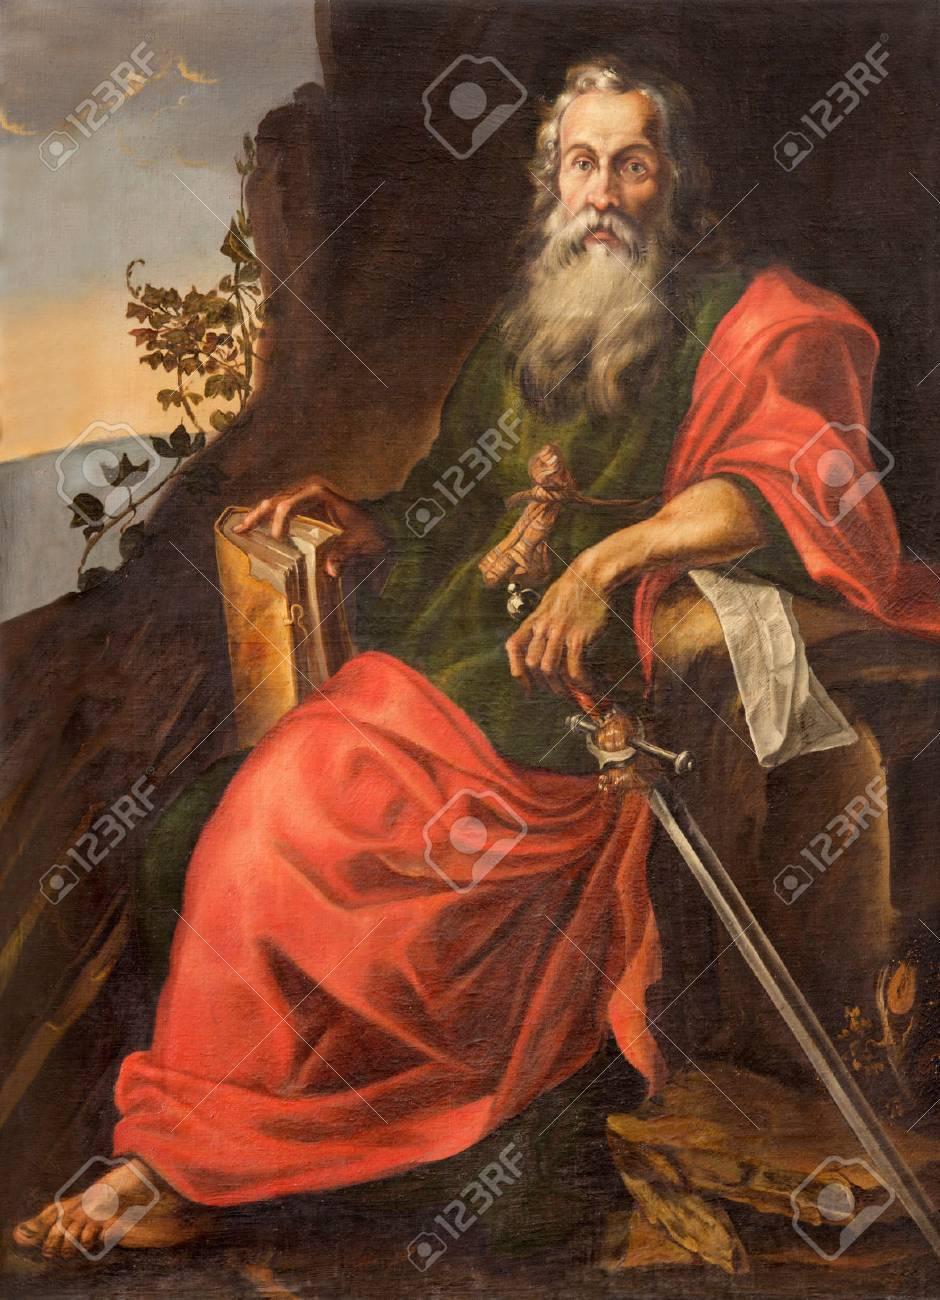 SALAMANCA, SPAIN, APRIL - 16, 2016: The St. Paul painting in Convento de San Esteban by unknown artist of 17. cent. - 58862564